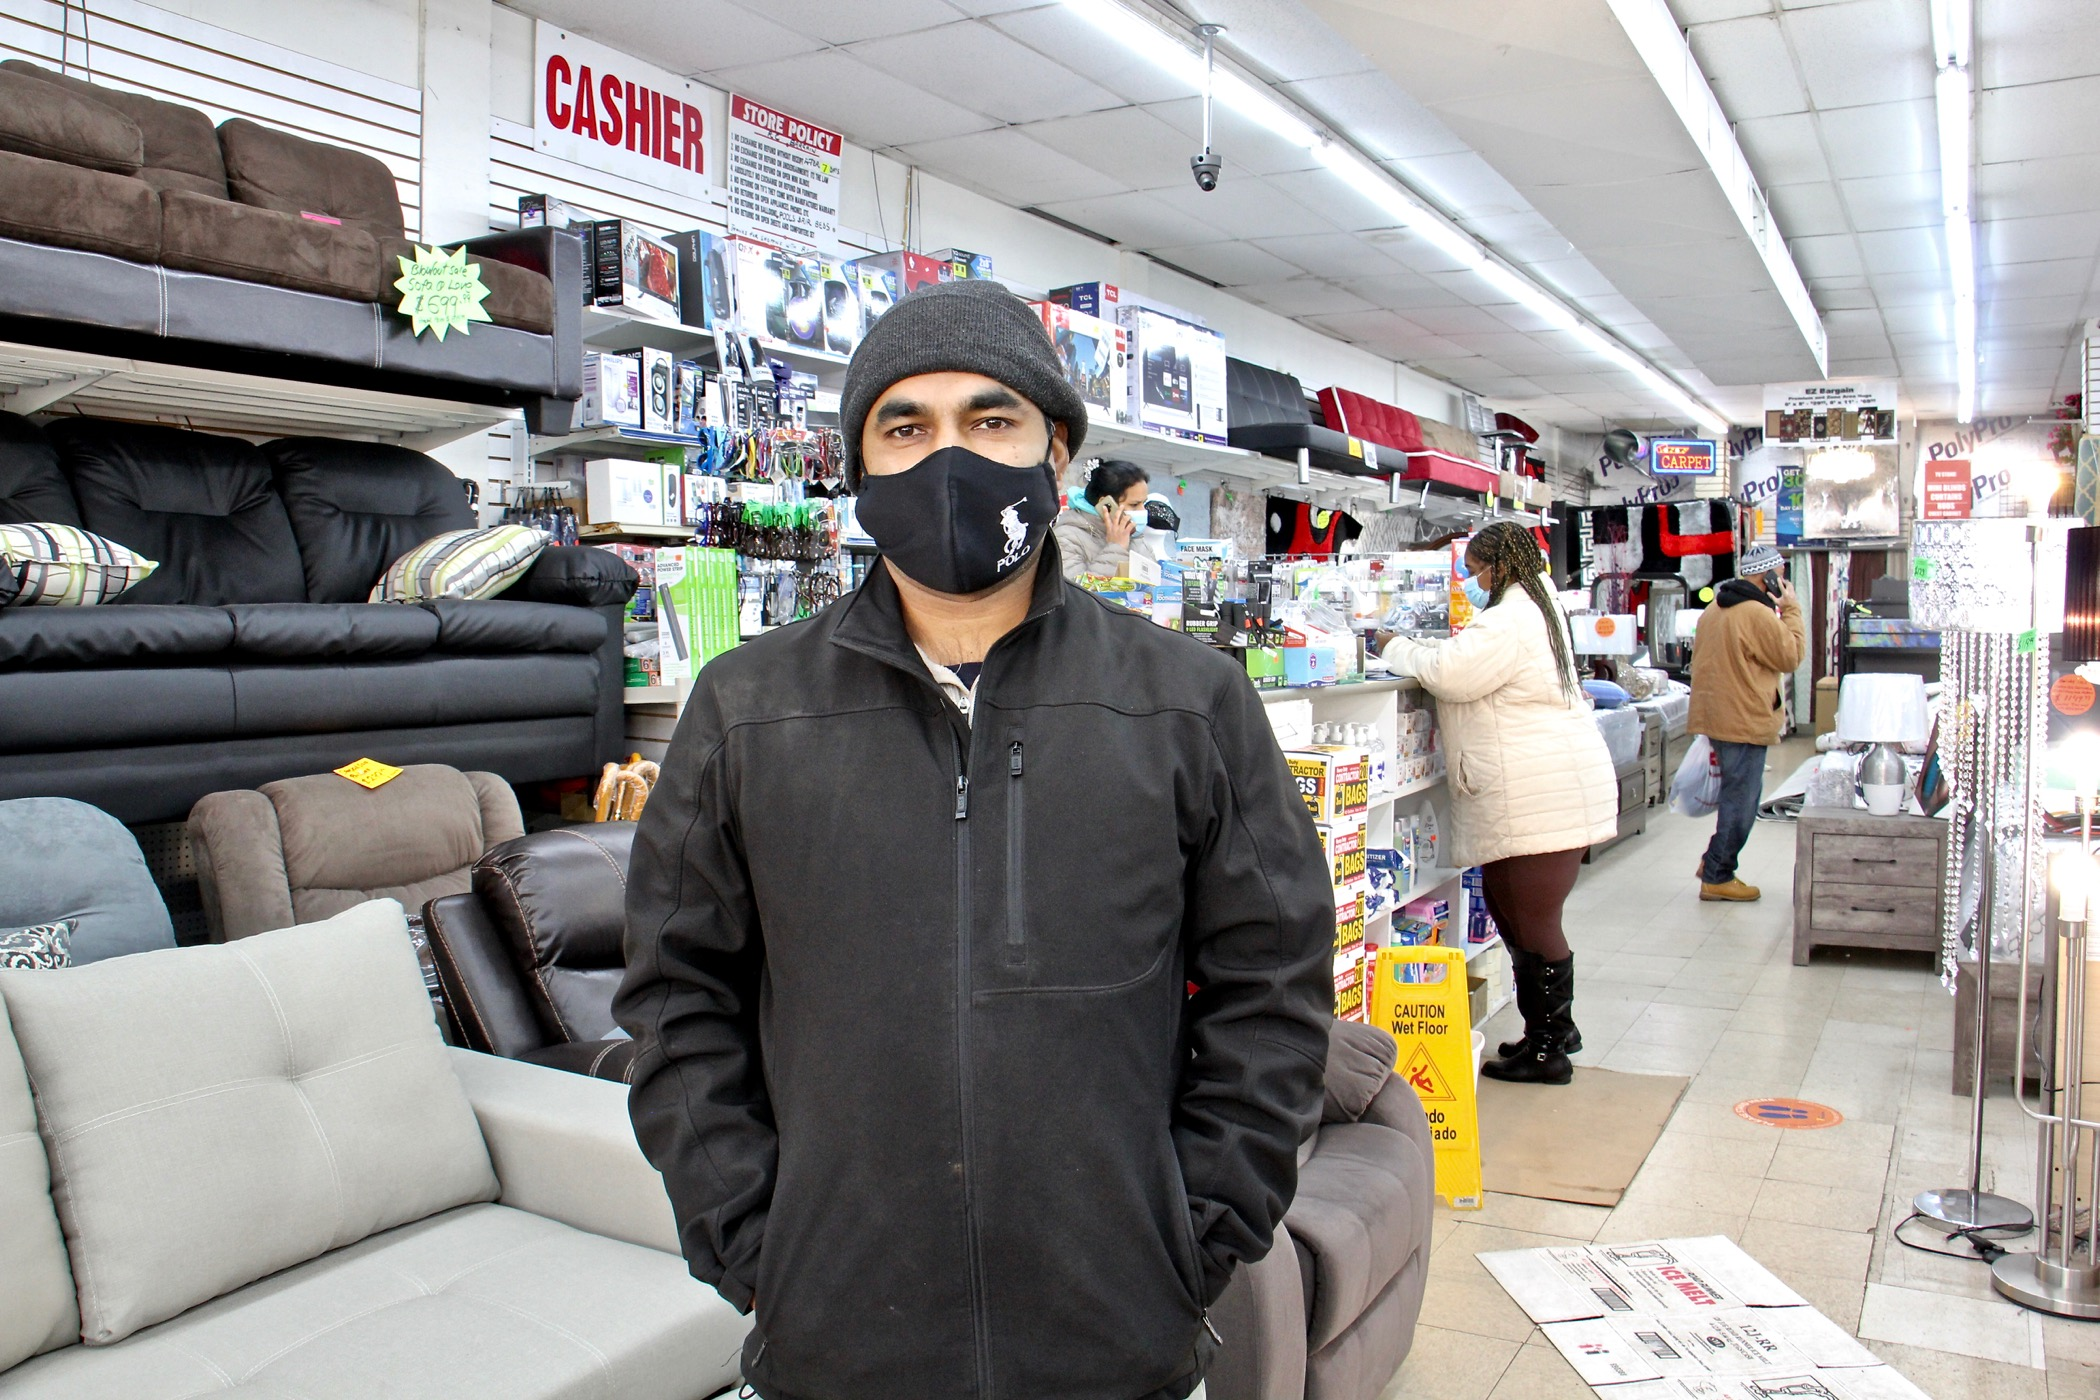 Mohammed Uddin, proprietor of RC Bargain store